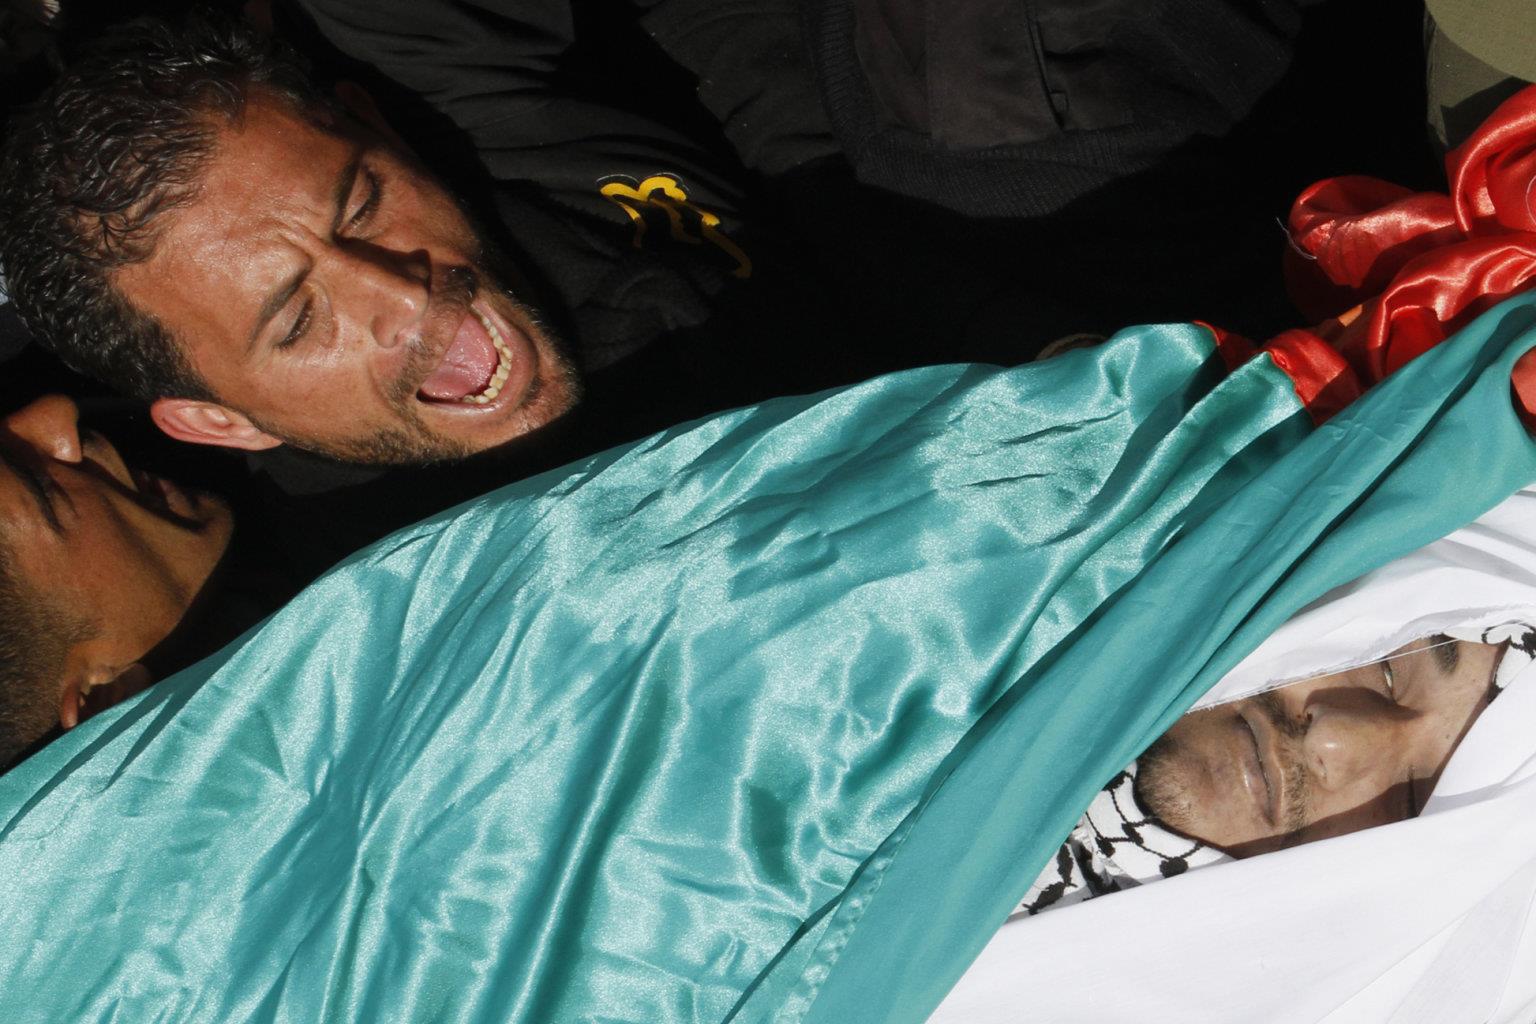 the 4th media the murder of yasser arafat